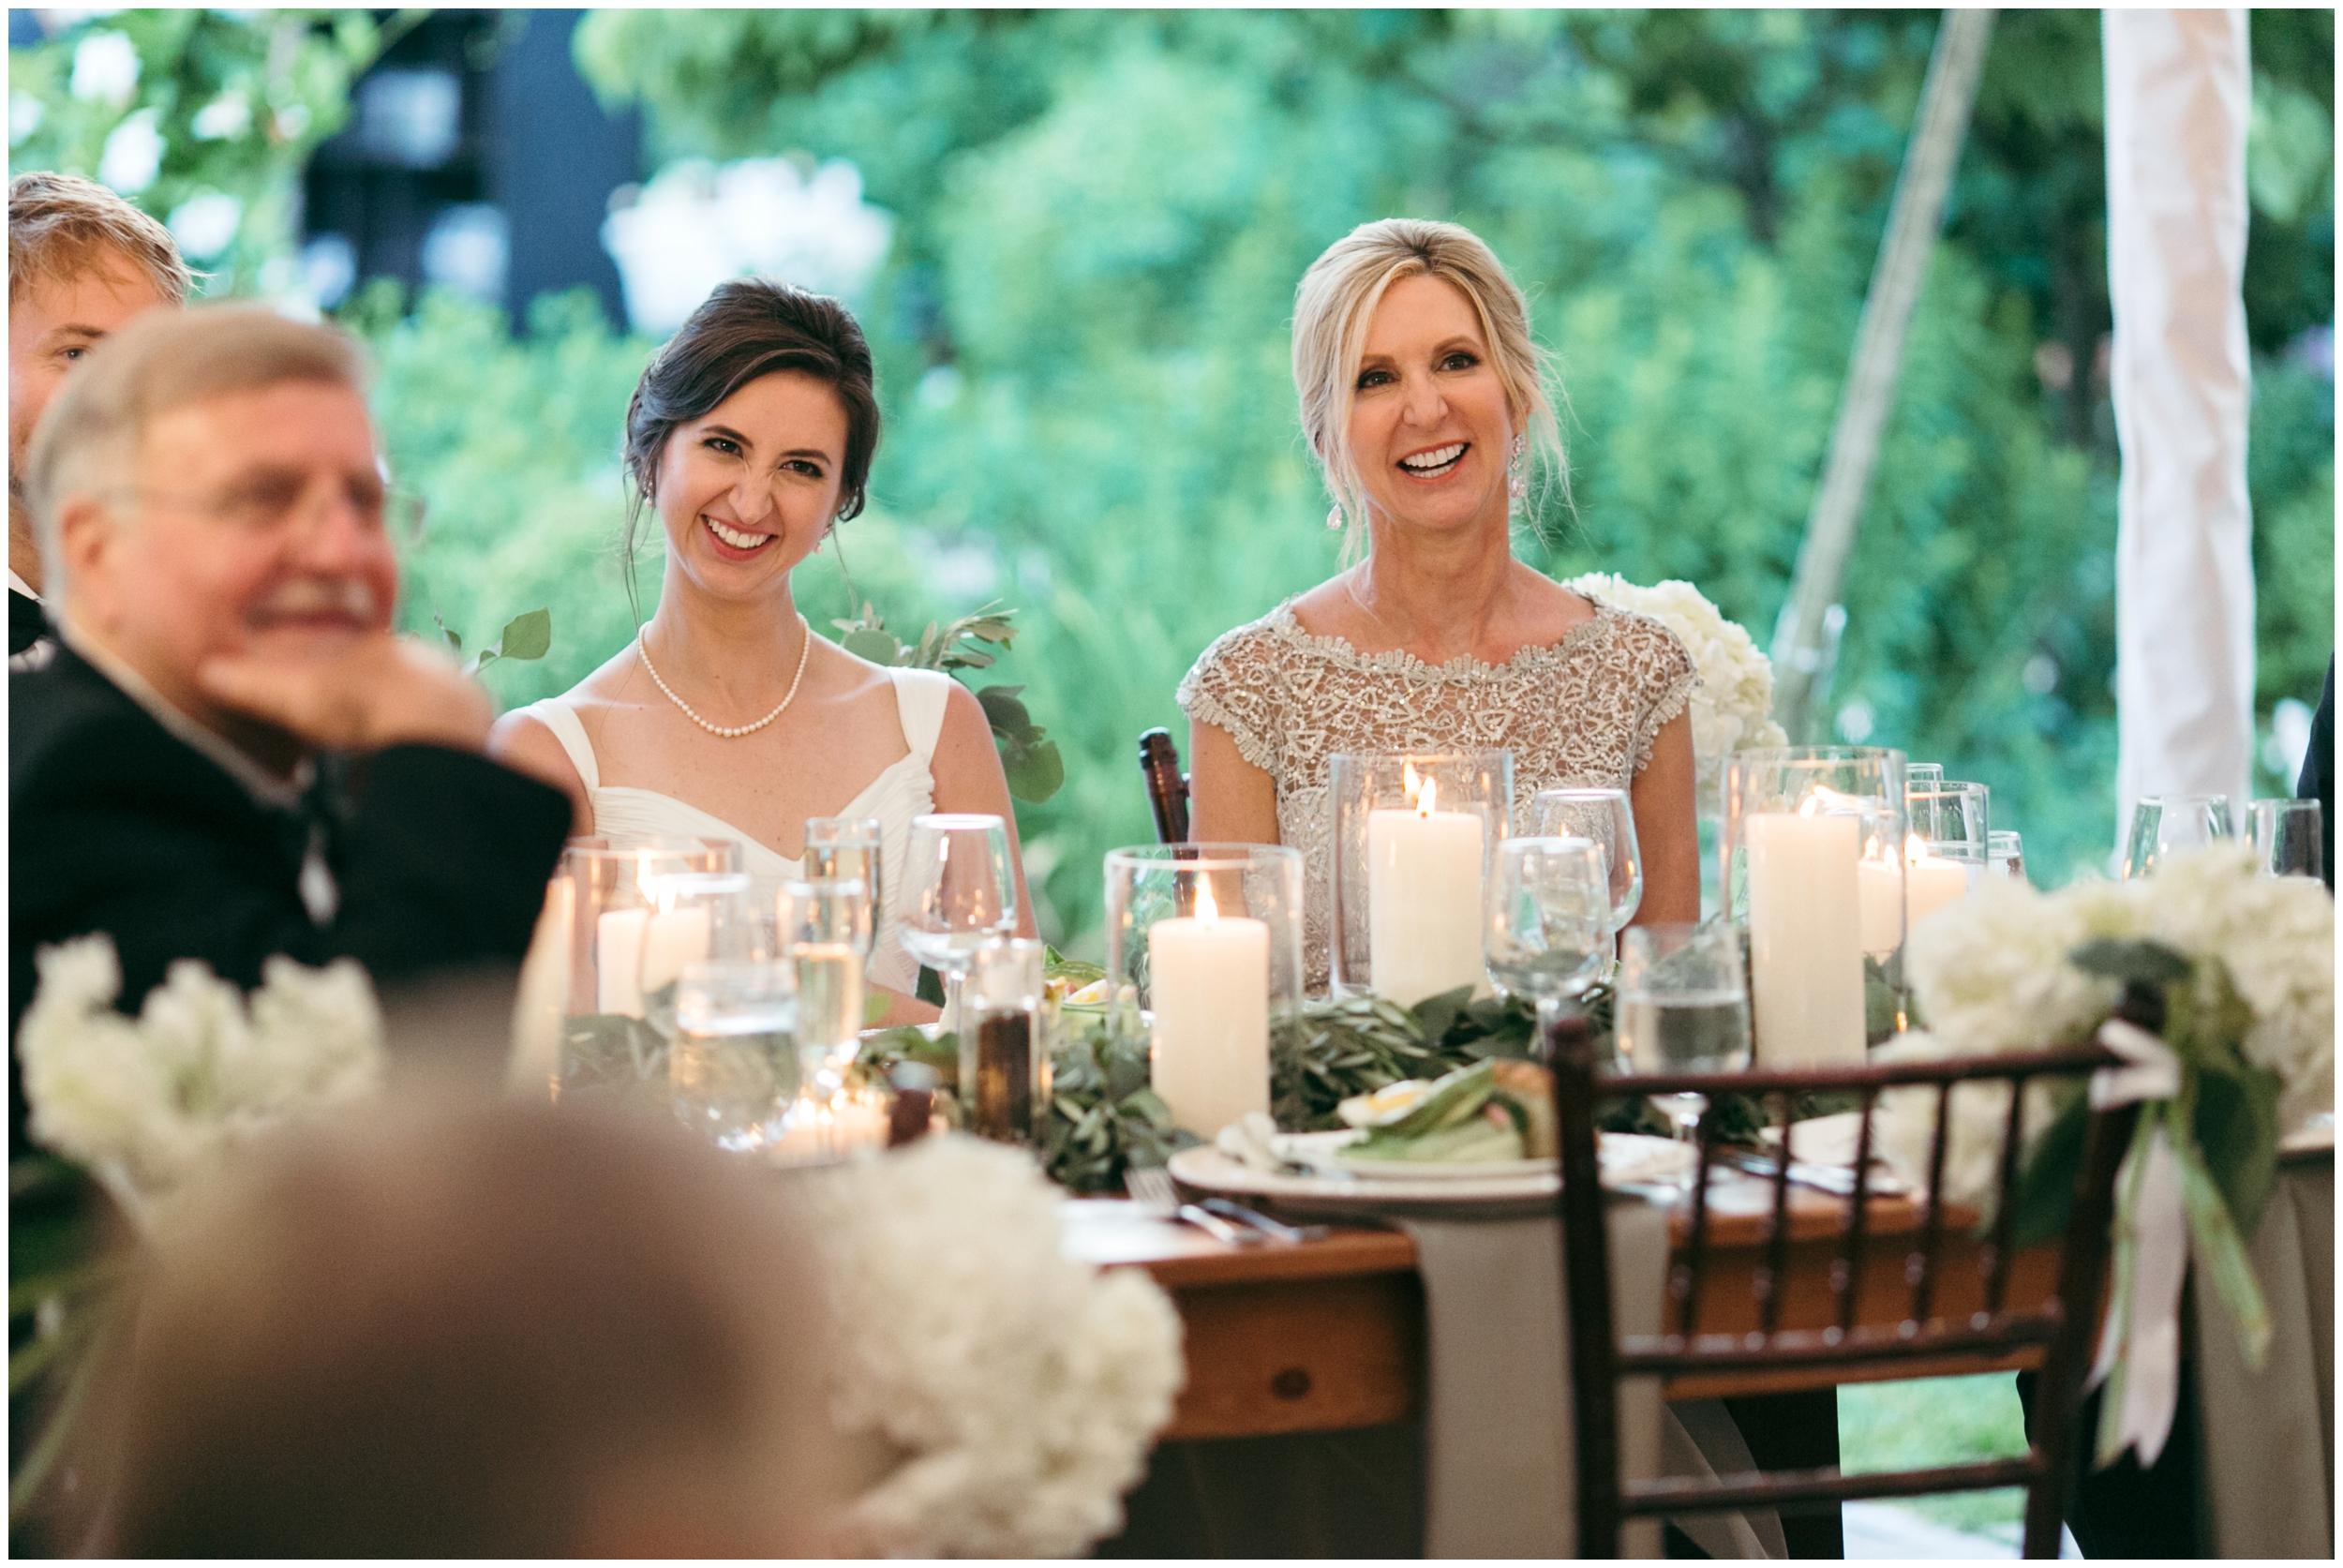 Willowdale-Estate-Wedding-Bailey-Q-Photo-Boston-Wedding-Photographer-085.JPG